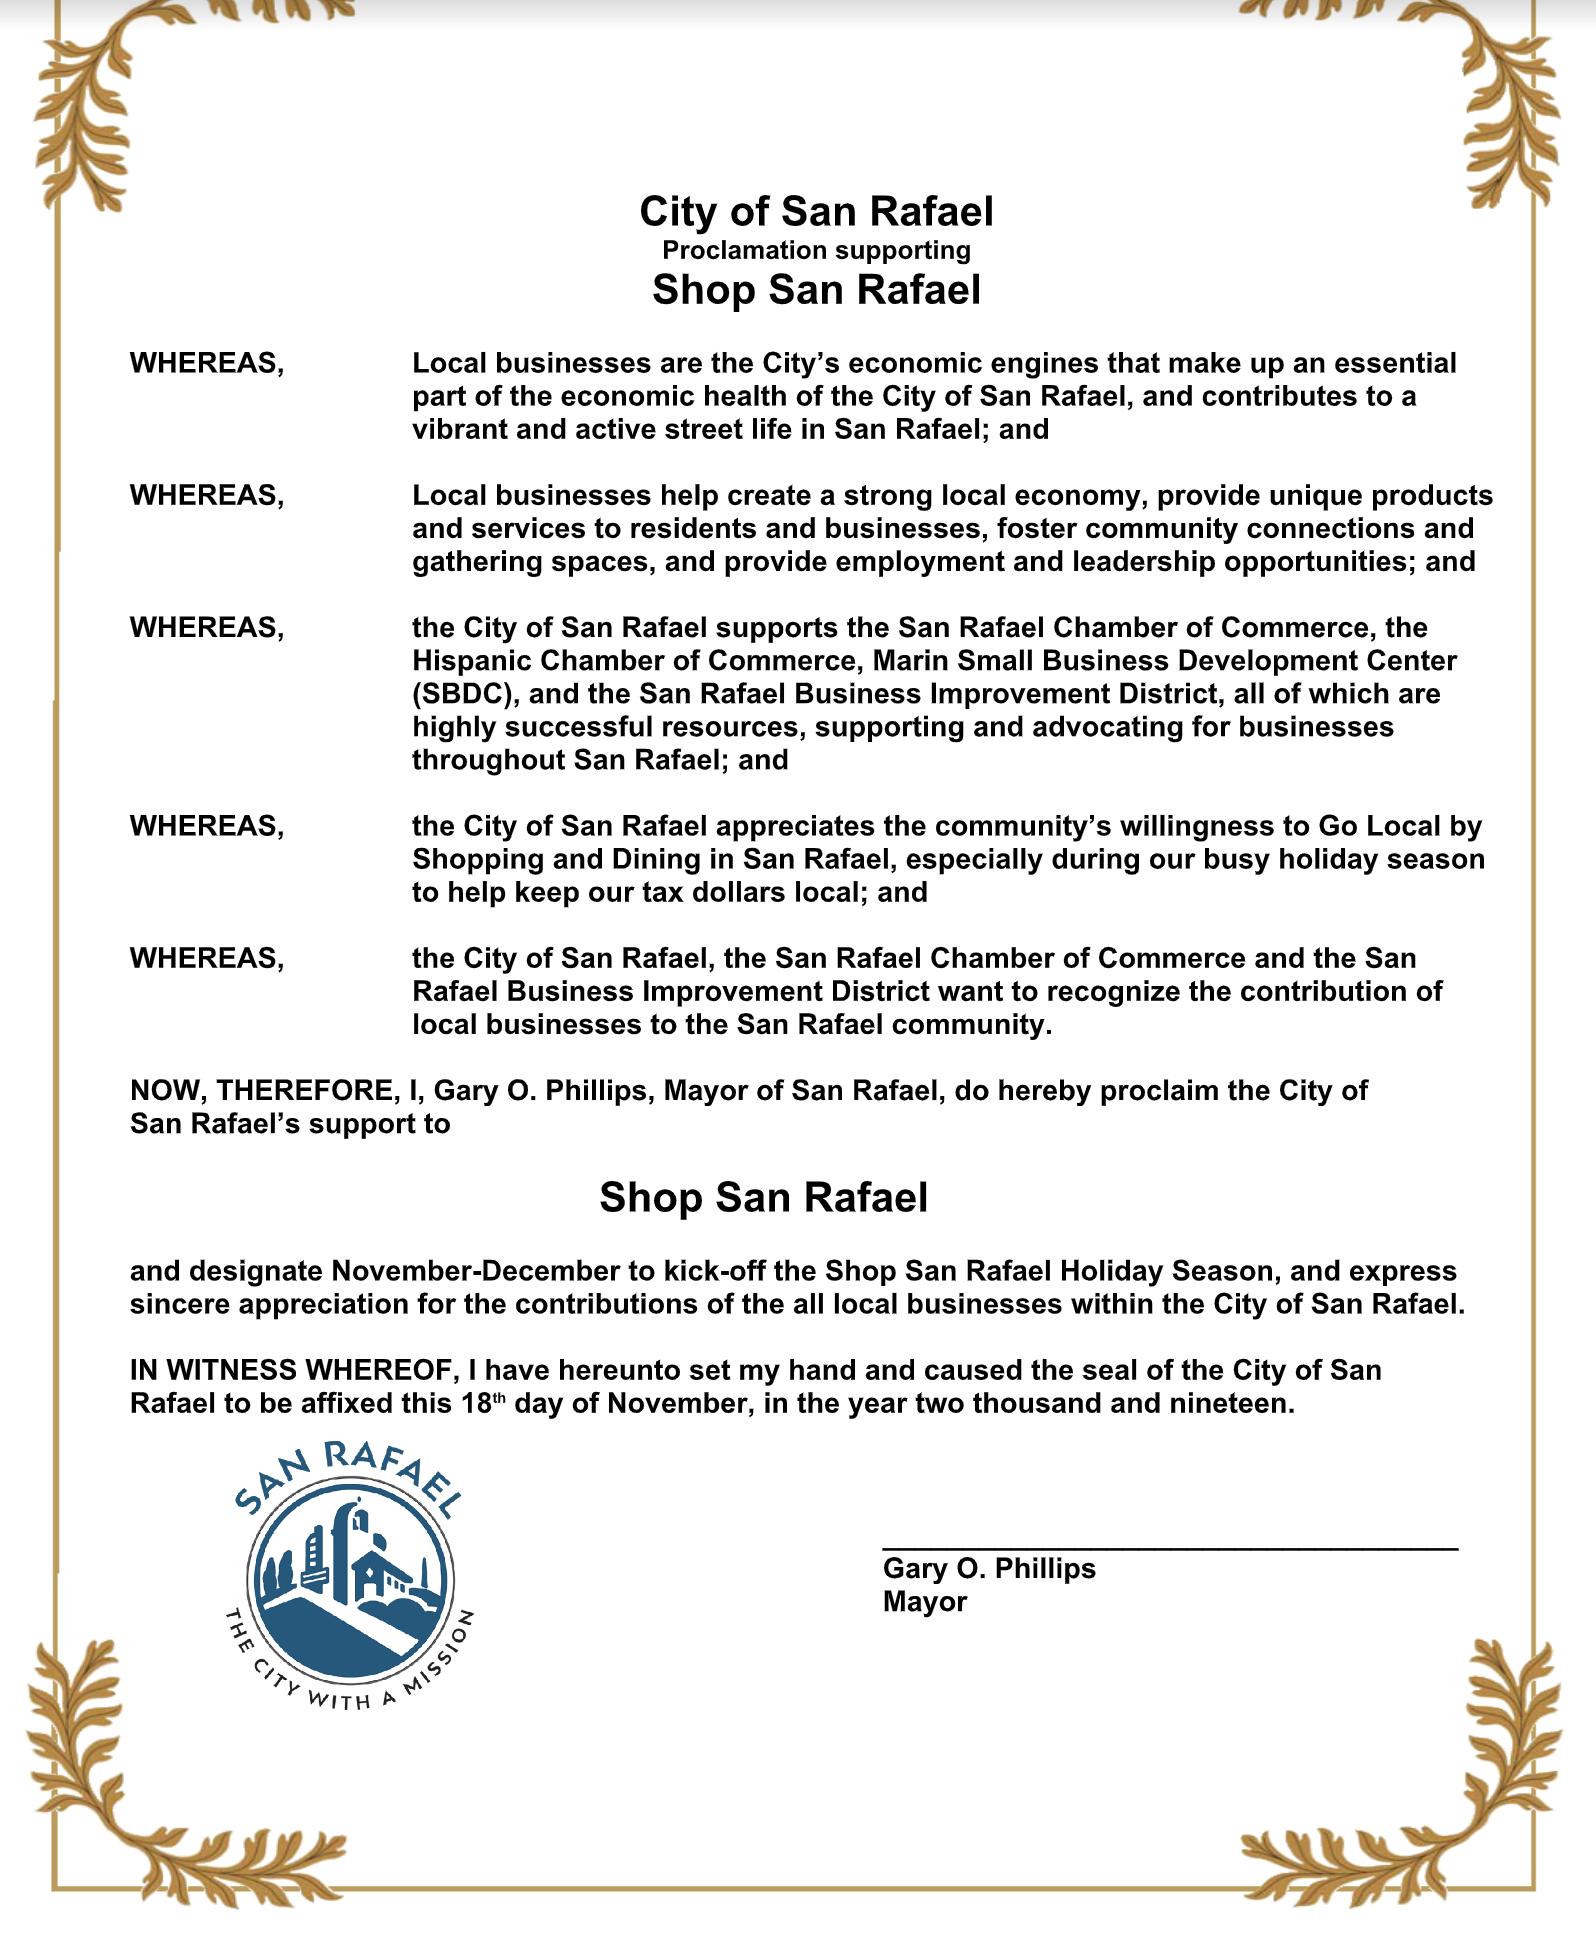 Shop San Rafael Proclamation